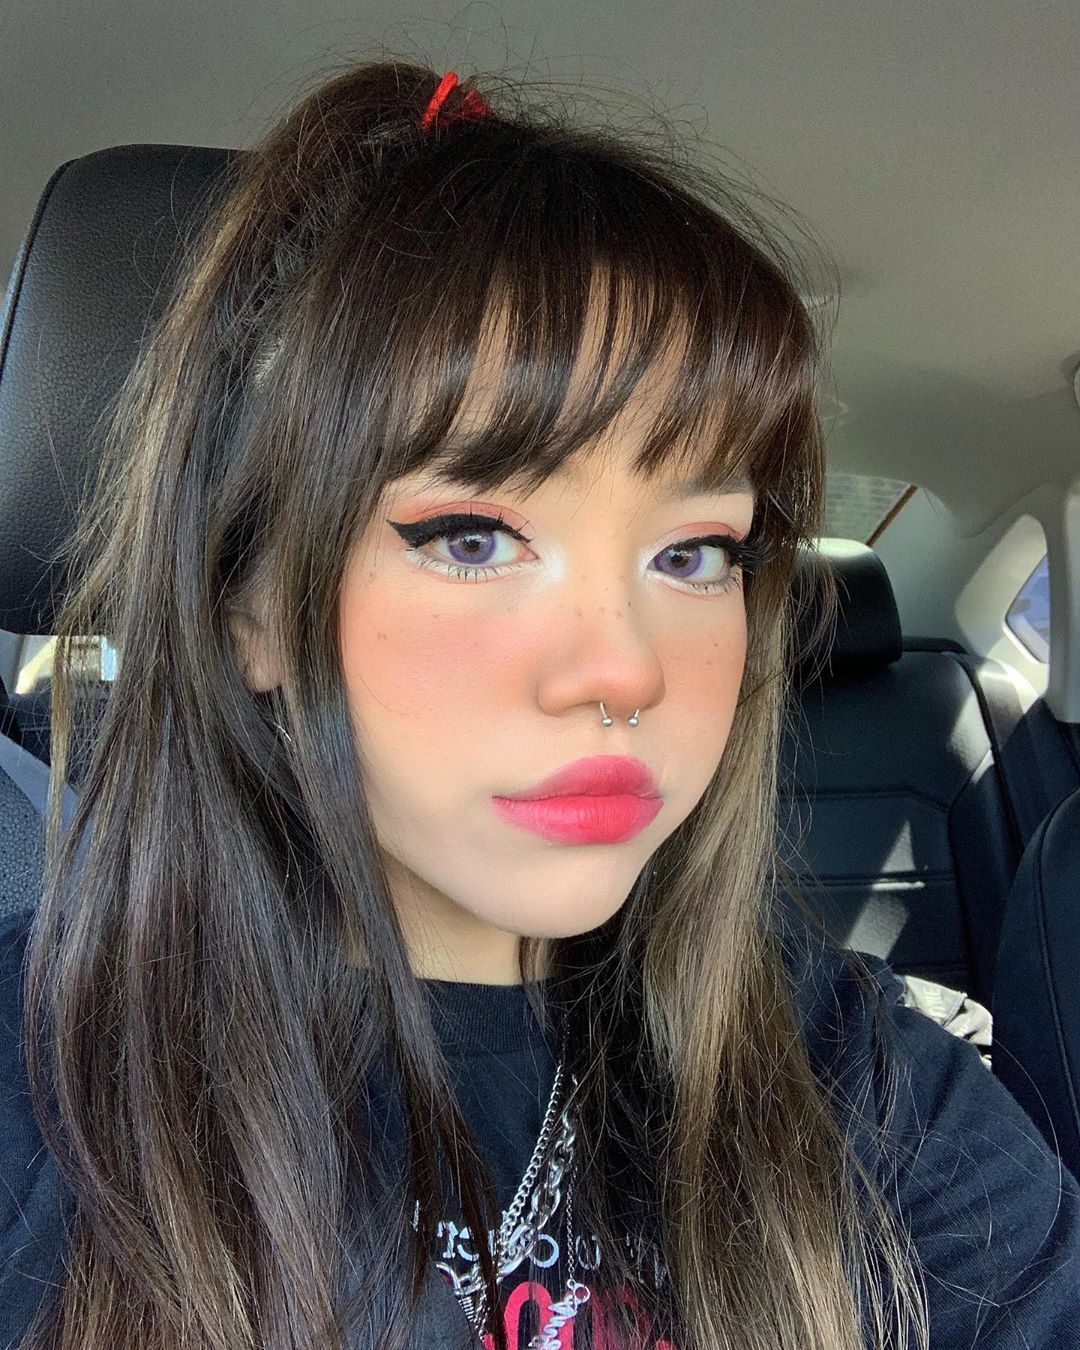 Pin By Jaylene Martinez Rosas On Asian Invasion In 2020 Beautiful Girl Makeup Aesthetic Hair Makeup Looks